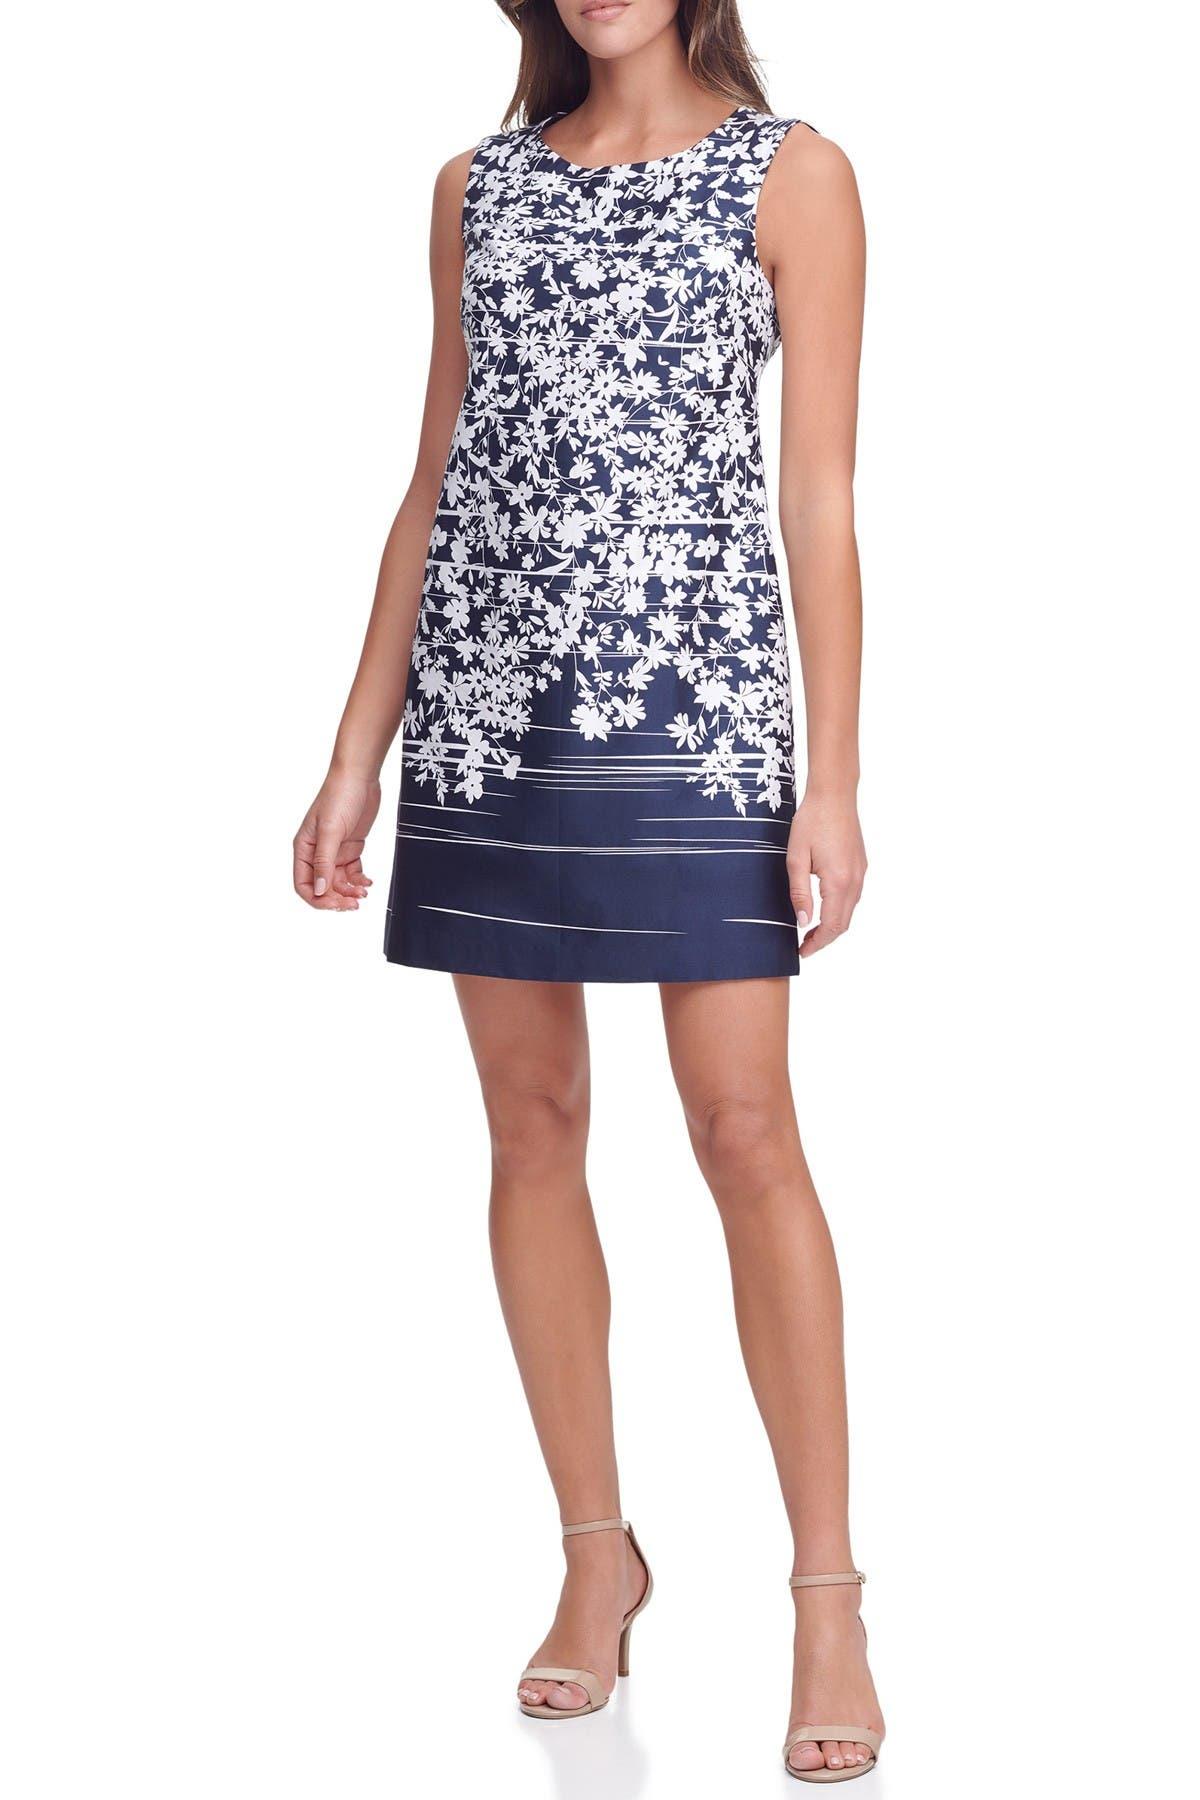 Tommy Hilfiger Dresses SLEEVELESS JASMINE BORDER SHIFT DRESS